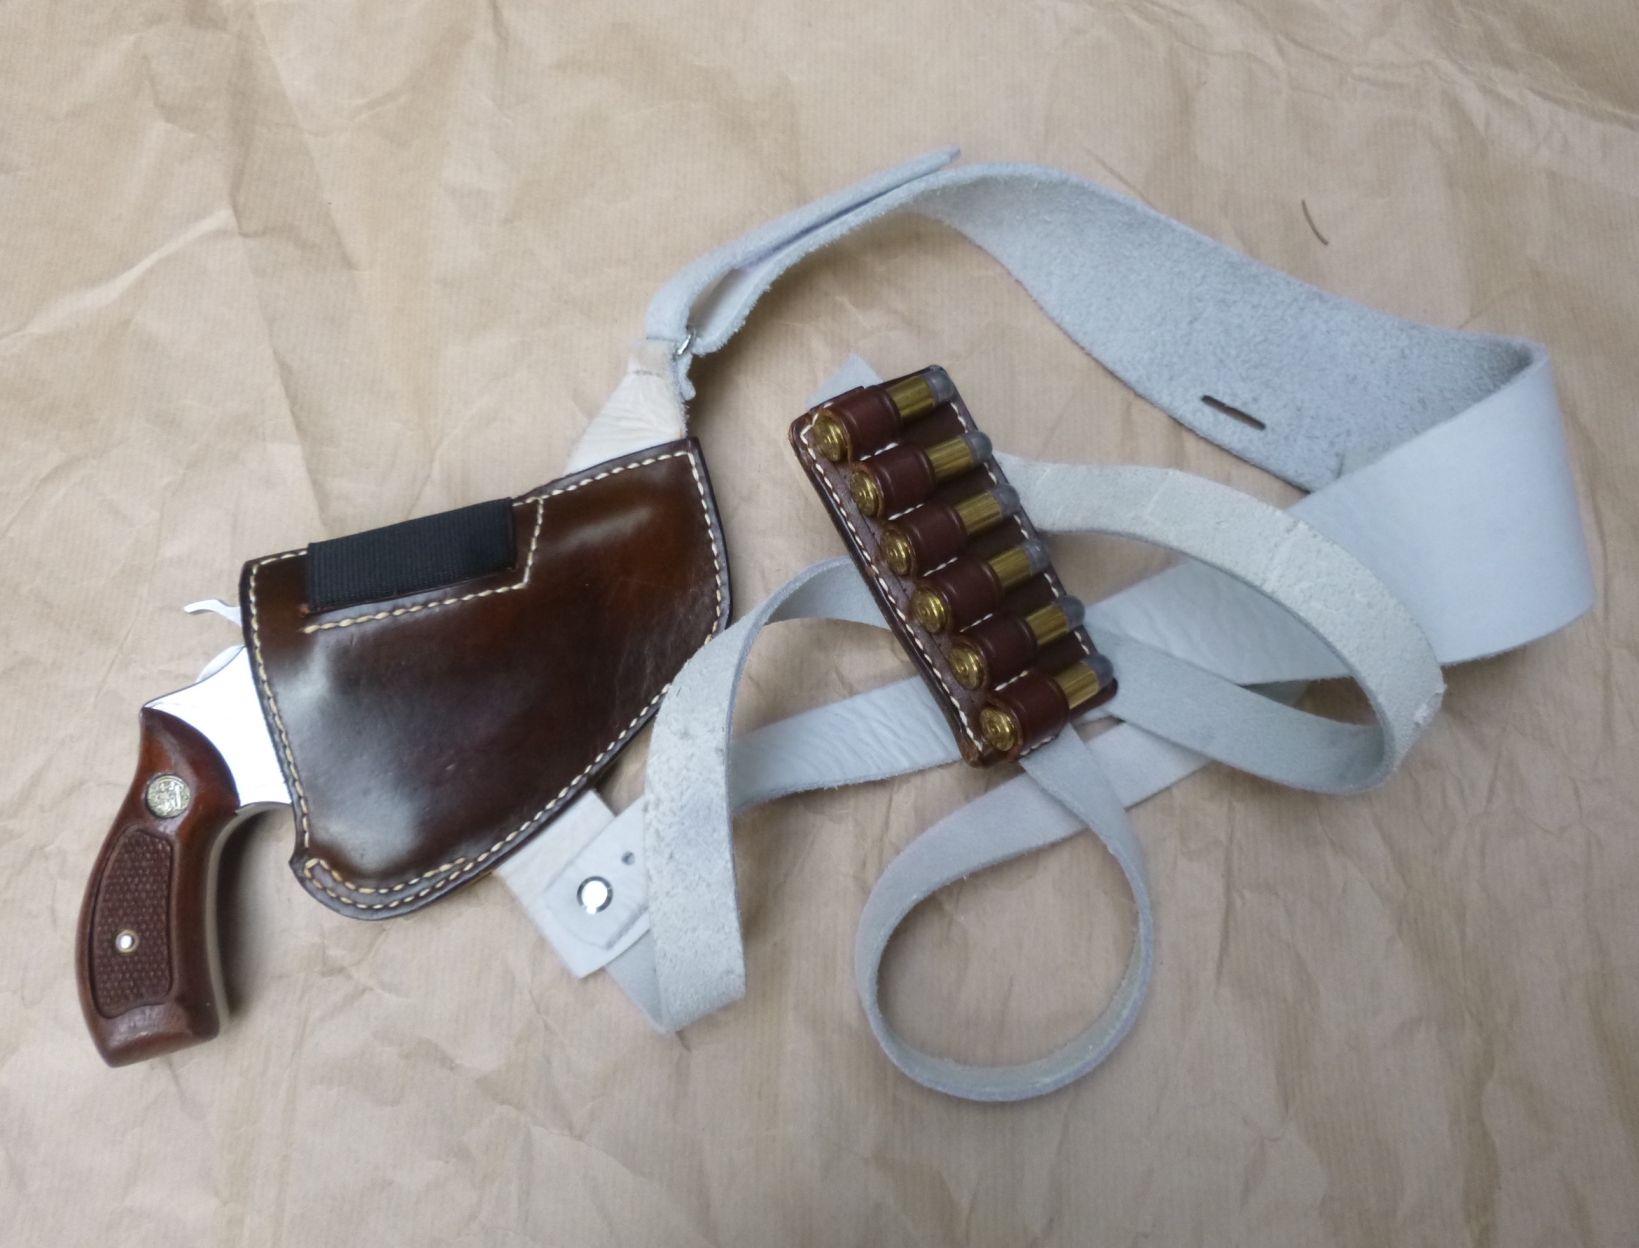 Custom replica of the Steve McQueen upside down shoulder holster rig ...